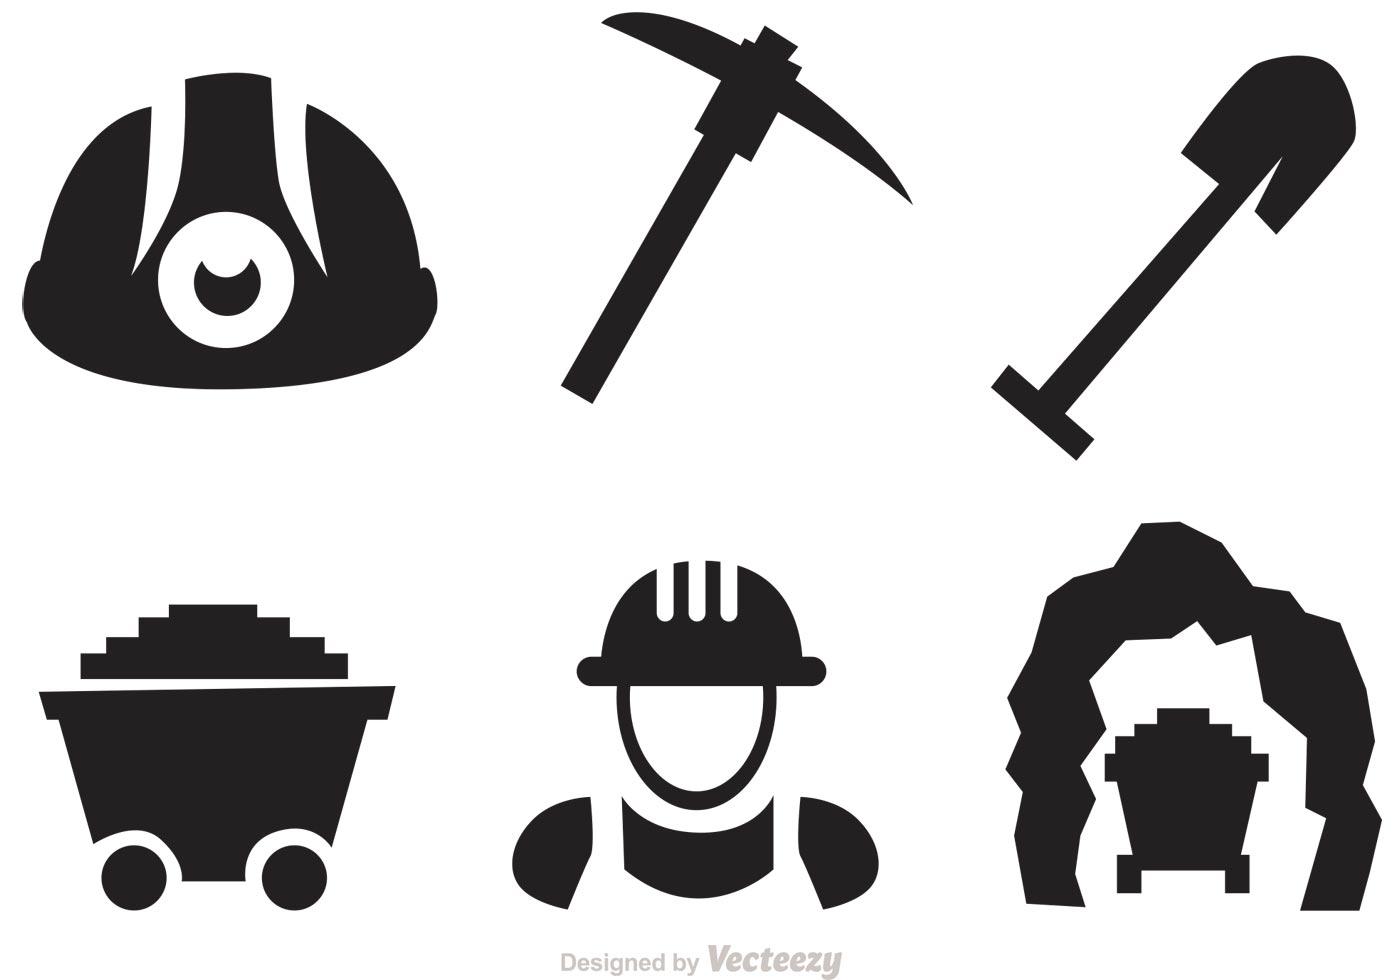 Mining industrial resource supplies definition